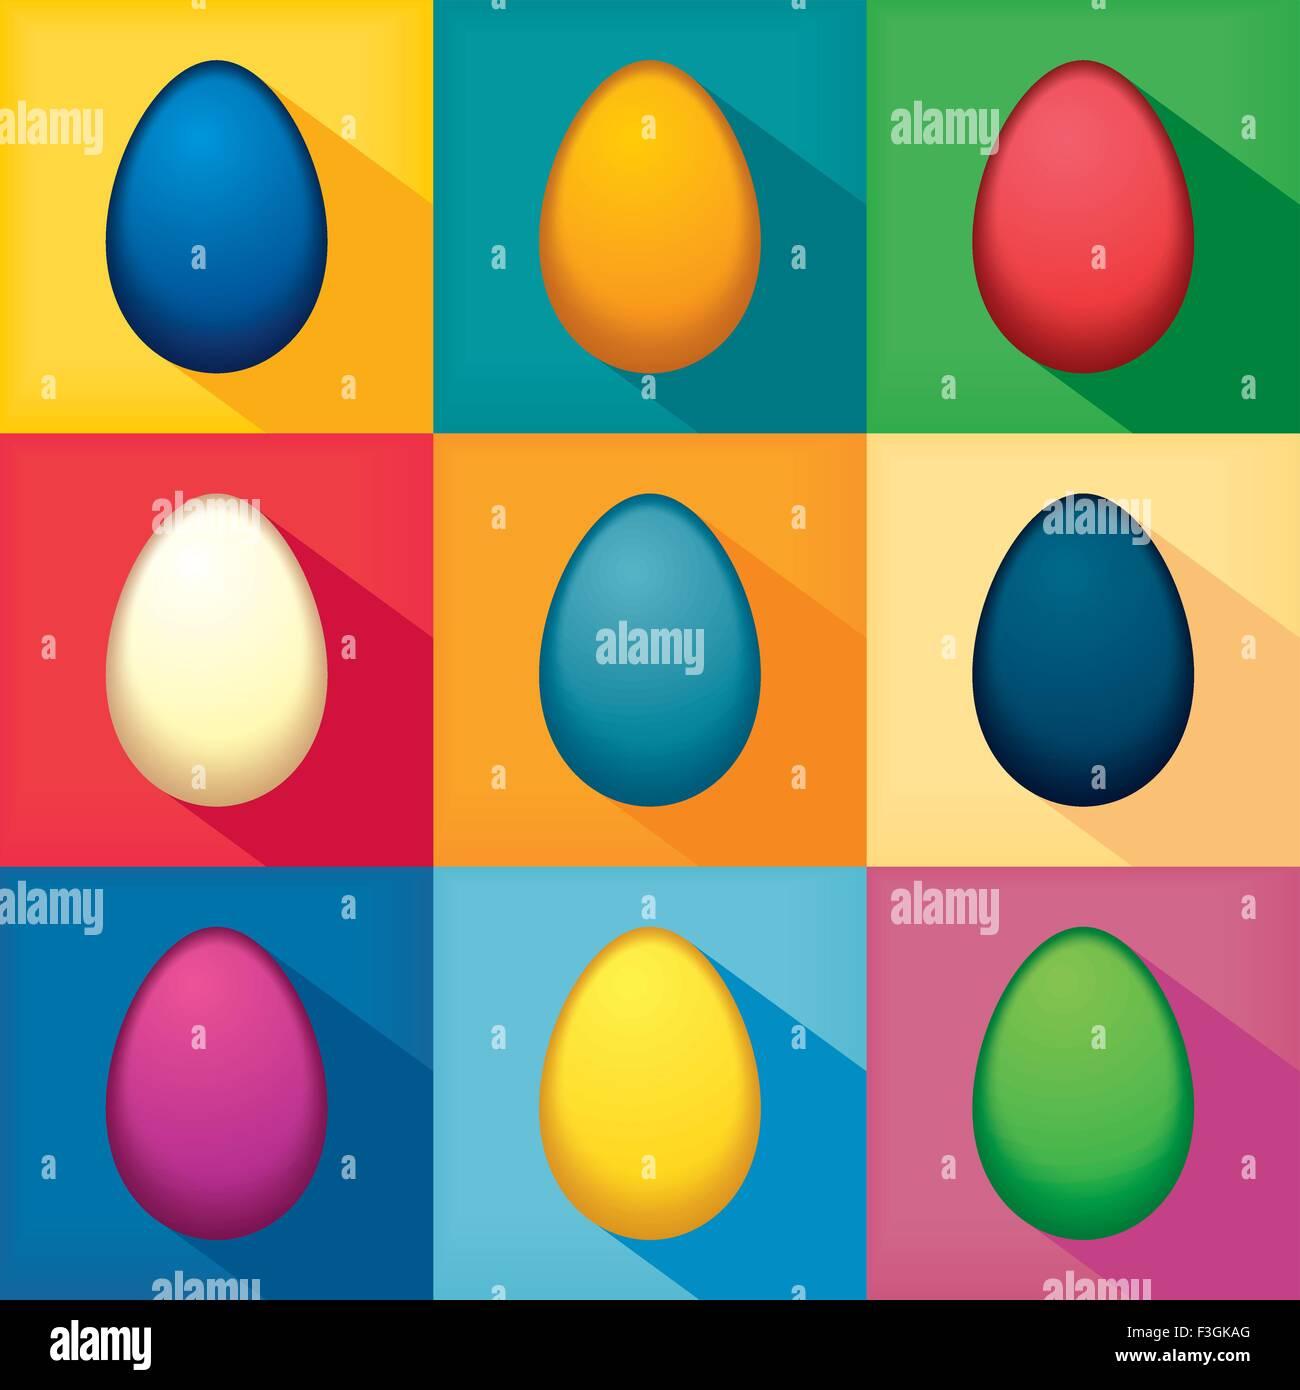 Flat pop art colorful eggs - Stock Image